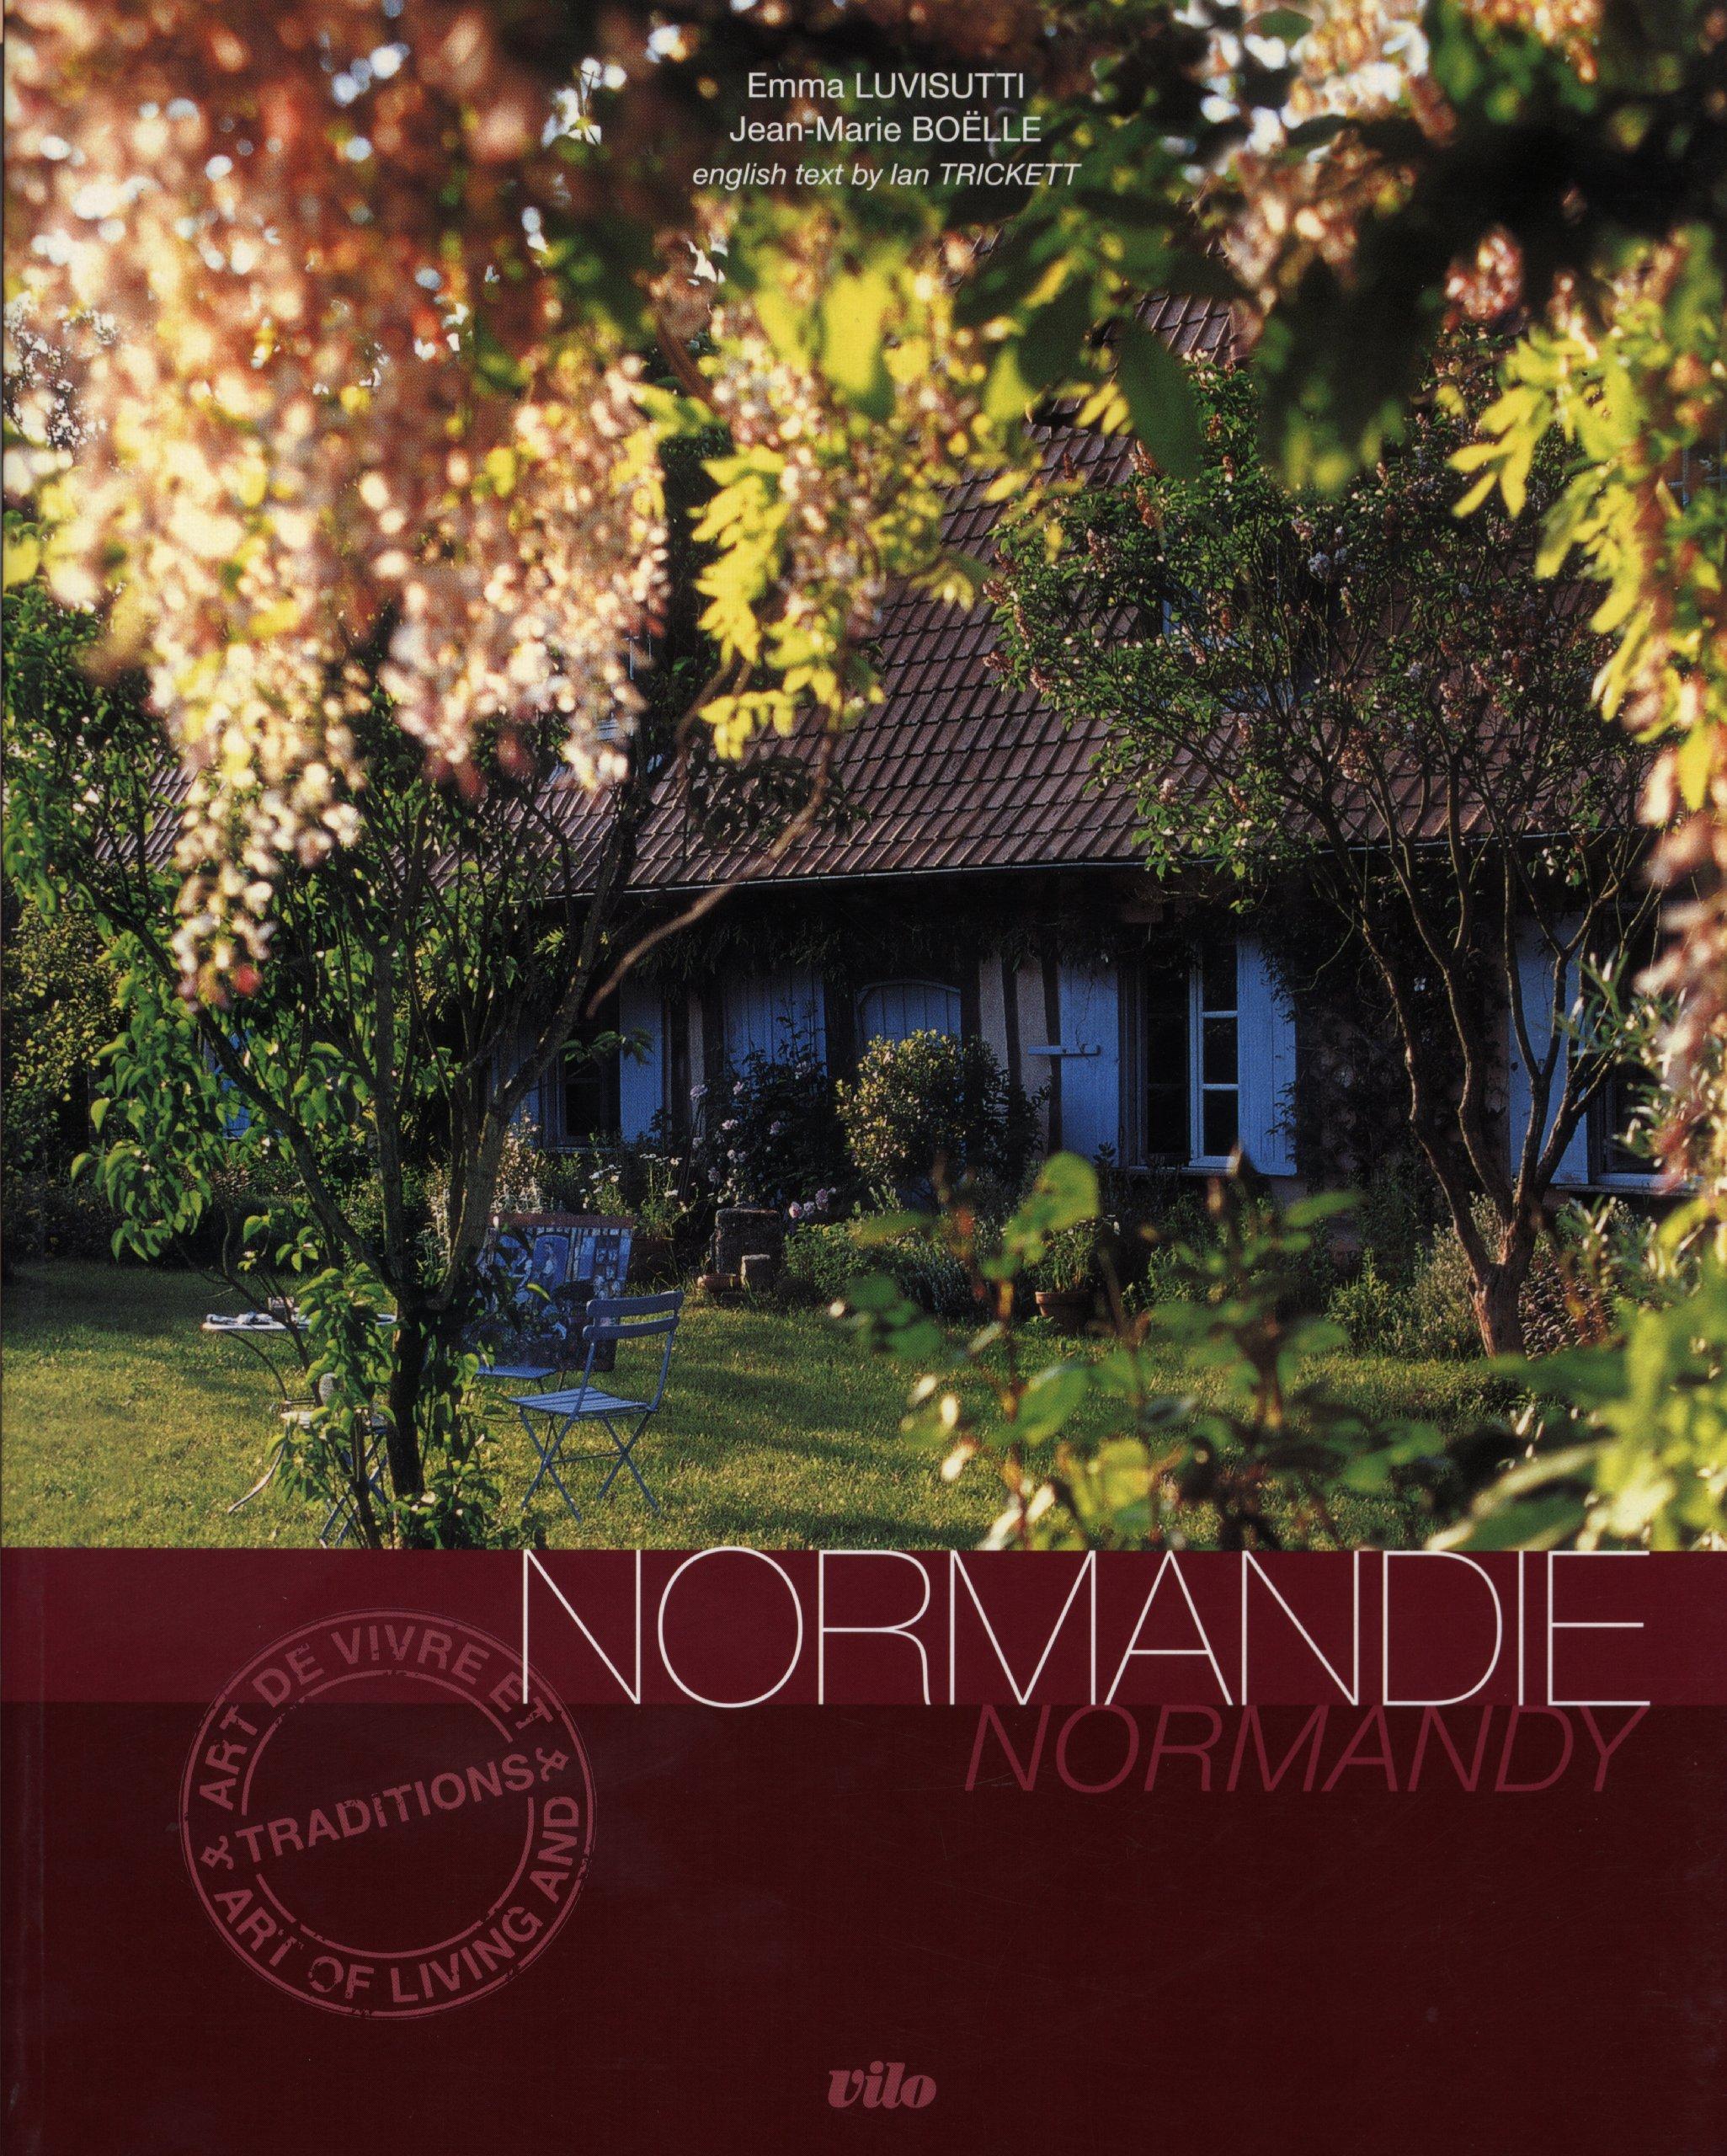 Normandie : Edition bilingue français-anglais Broché – 21 février 2007 Jean-Marie Boëlle Emma Luvisutti Ian Trickett Vilo